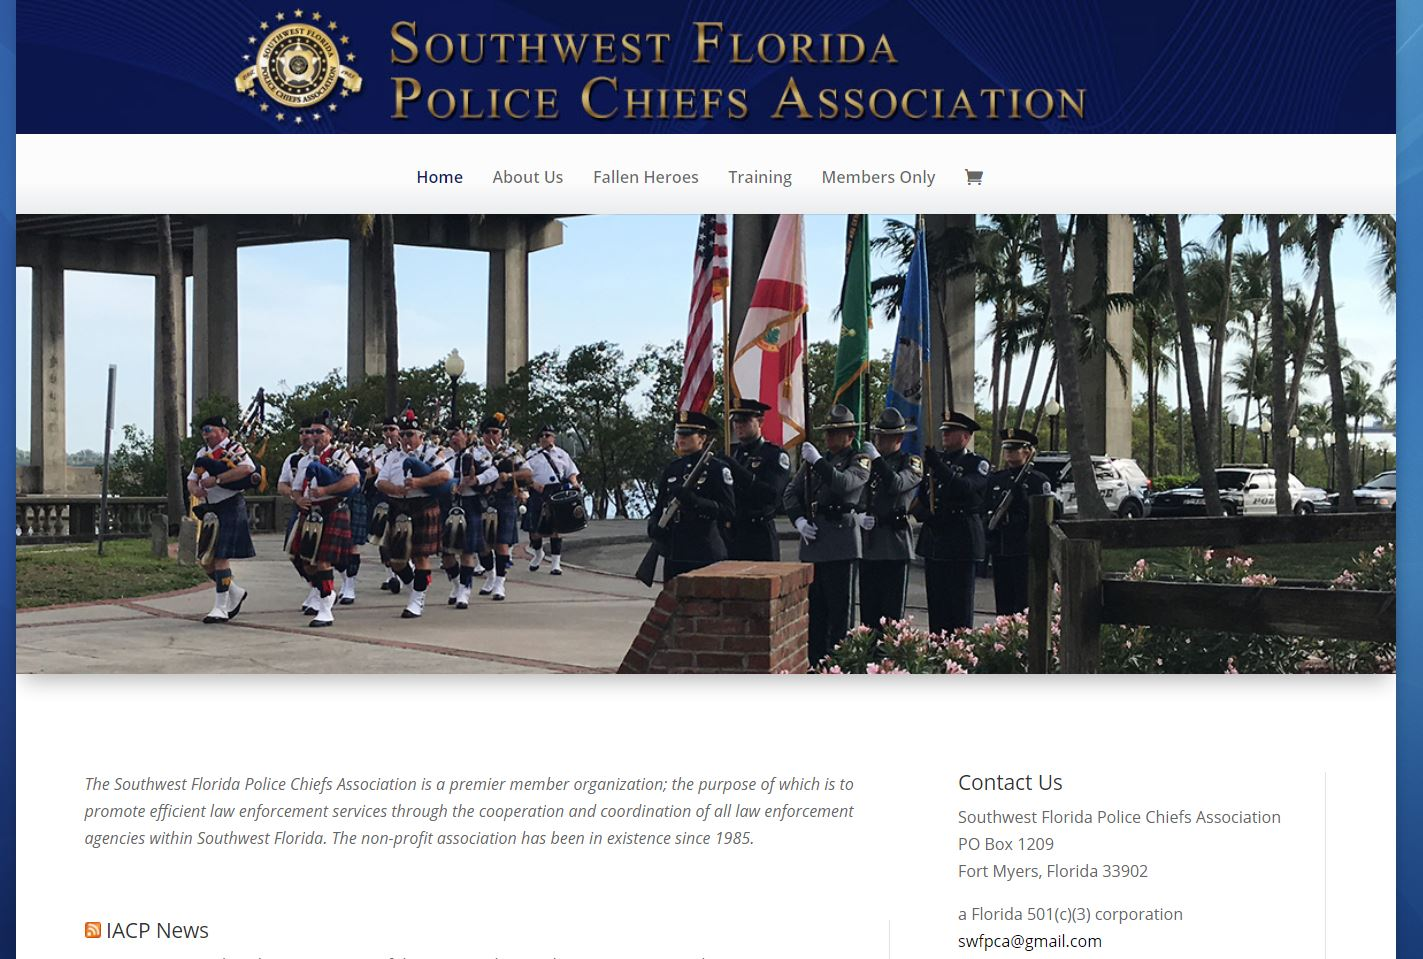 Southwest Florida Police Chiefs Associatoin